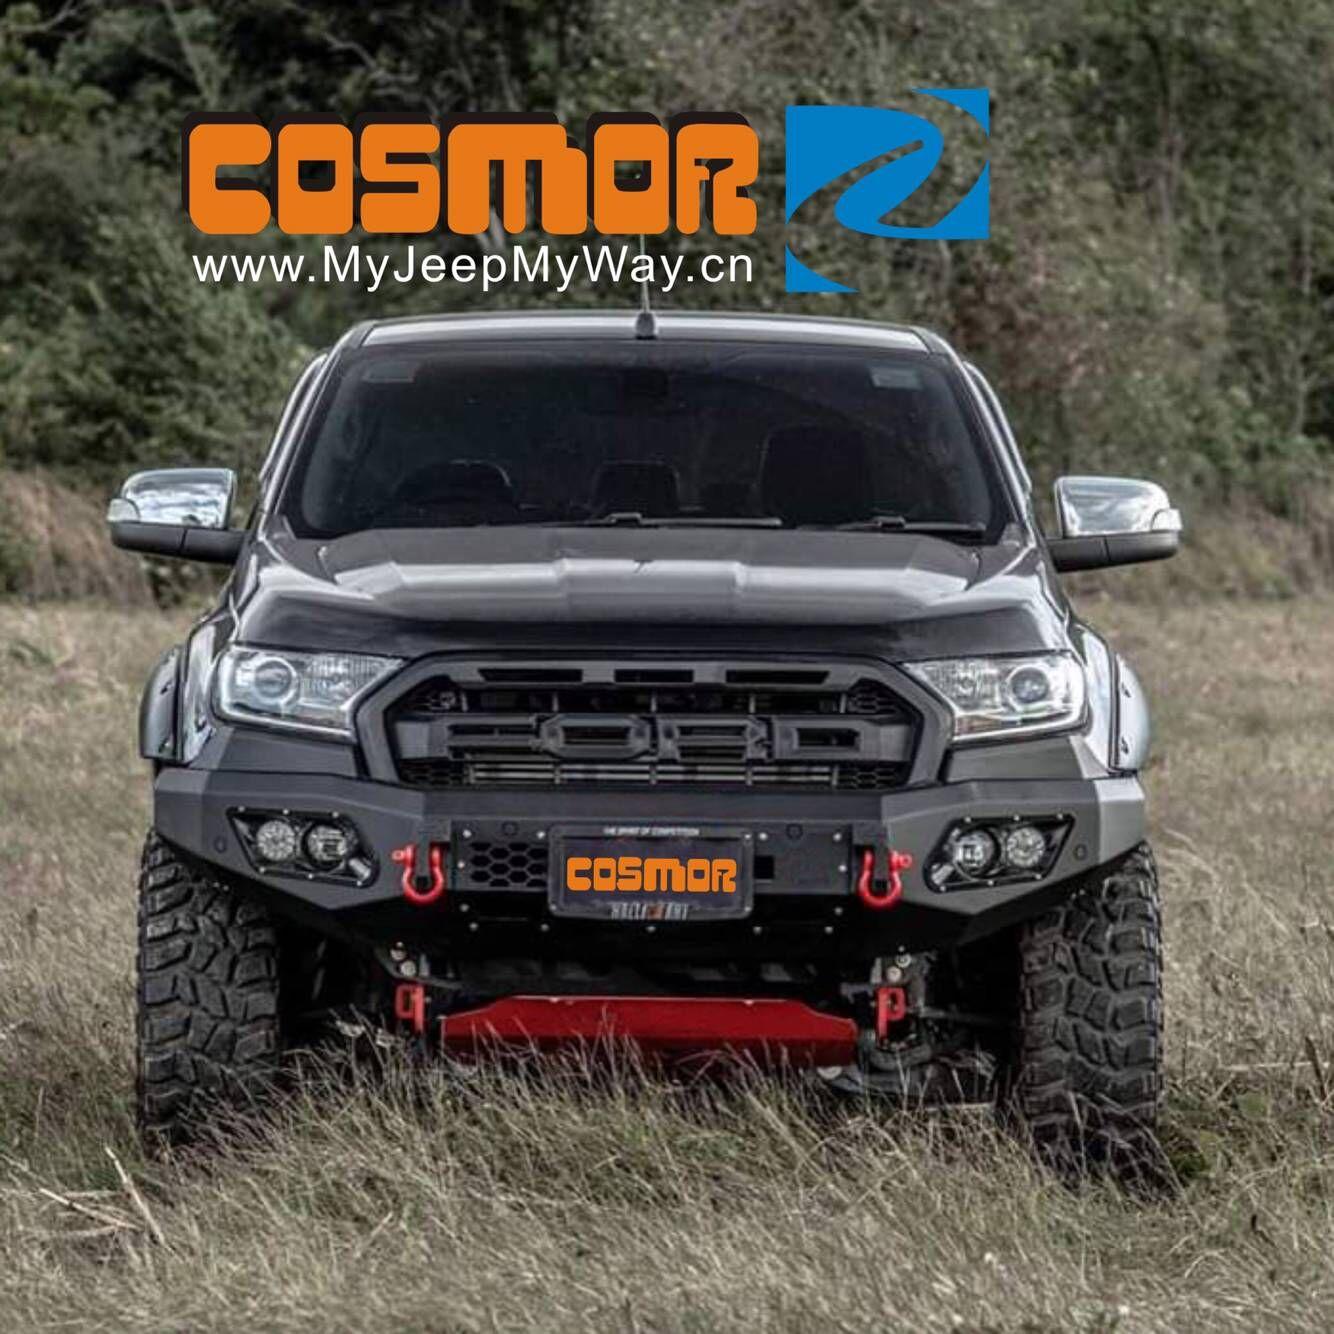 Pickup Truck Steel bumper, FrontBumper, Aluminum Bumper for Ford Ranger T6 T7,Vogo, Reve, Recco, NP300,